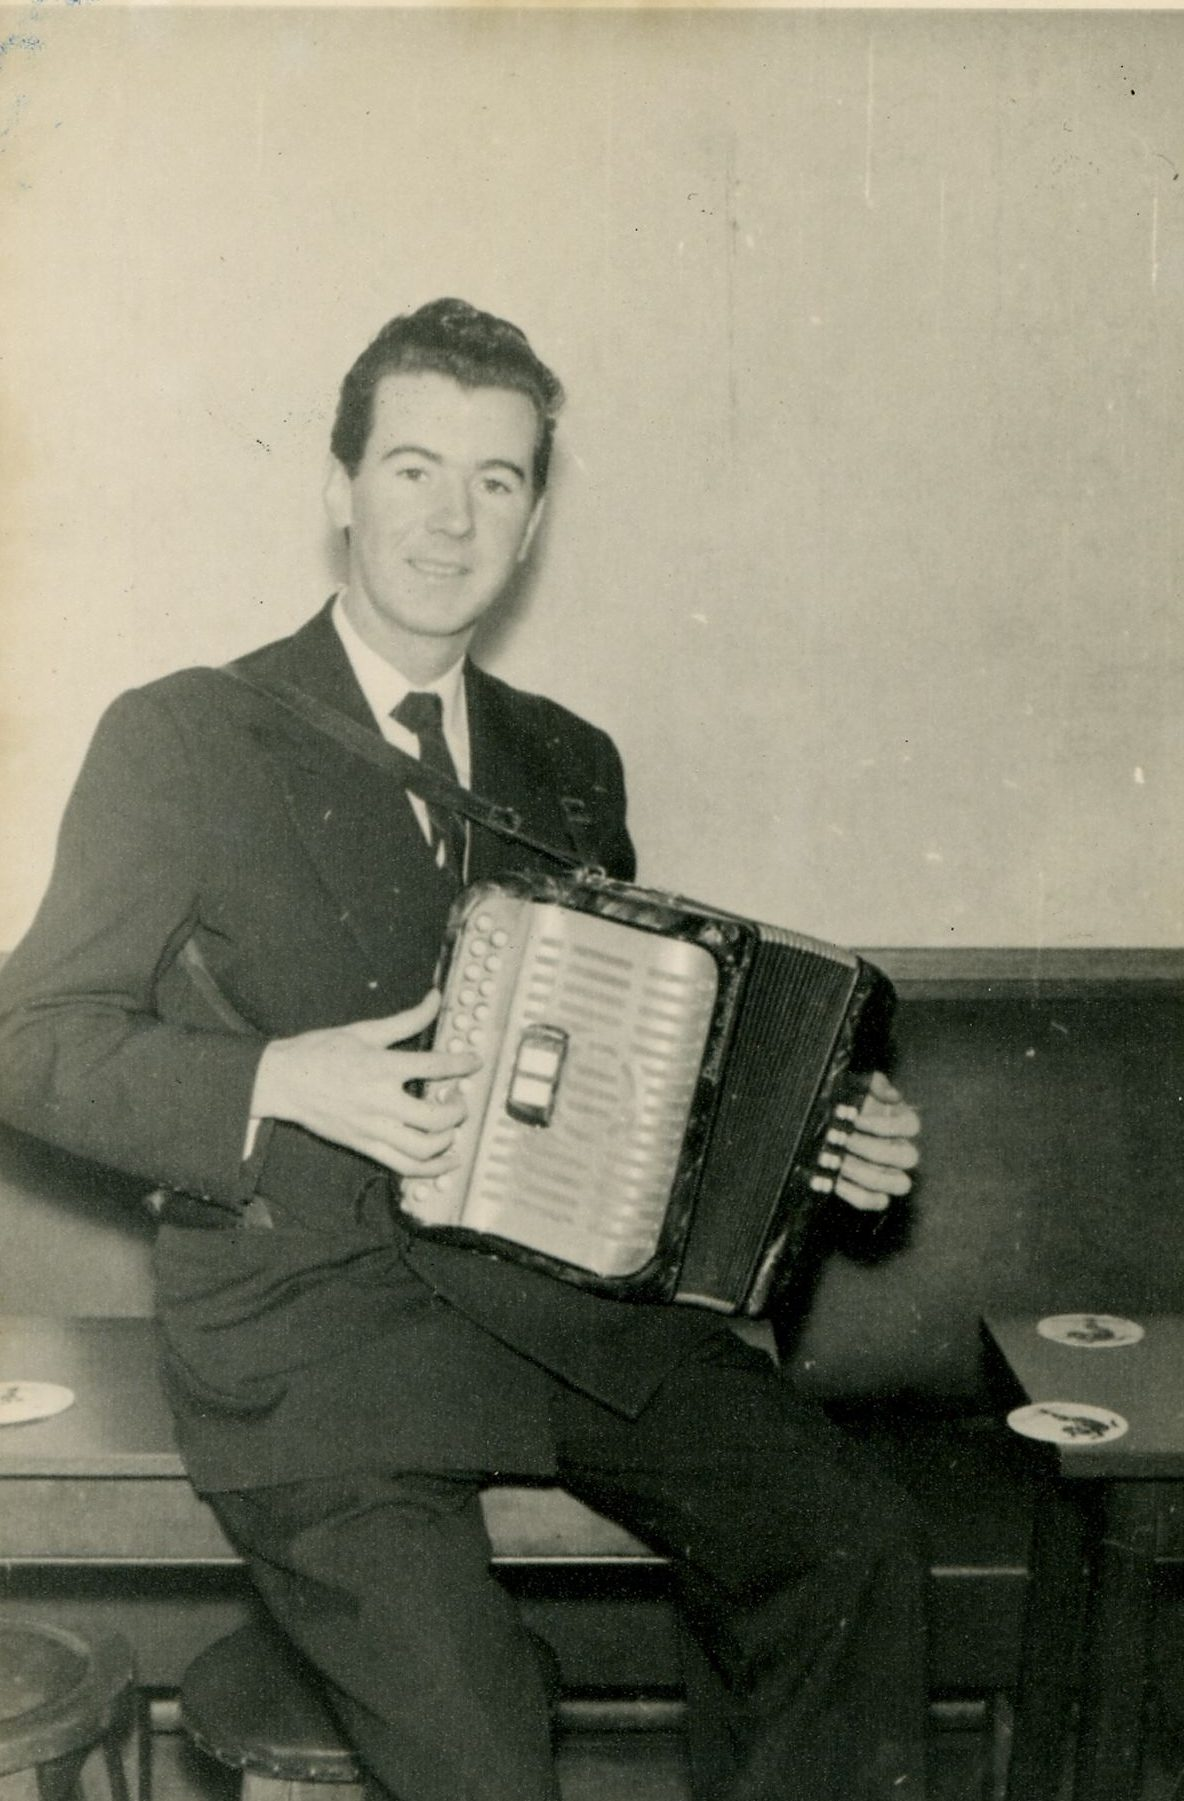 One of Three Legends on the Irish B/C Accordion